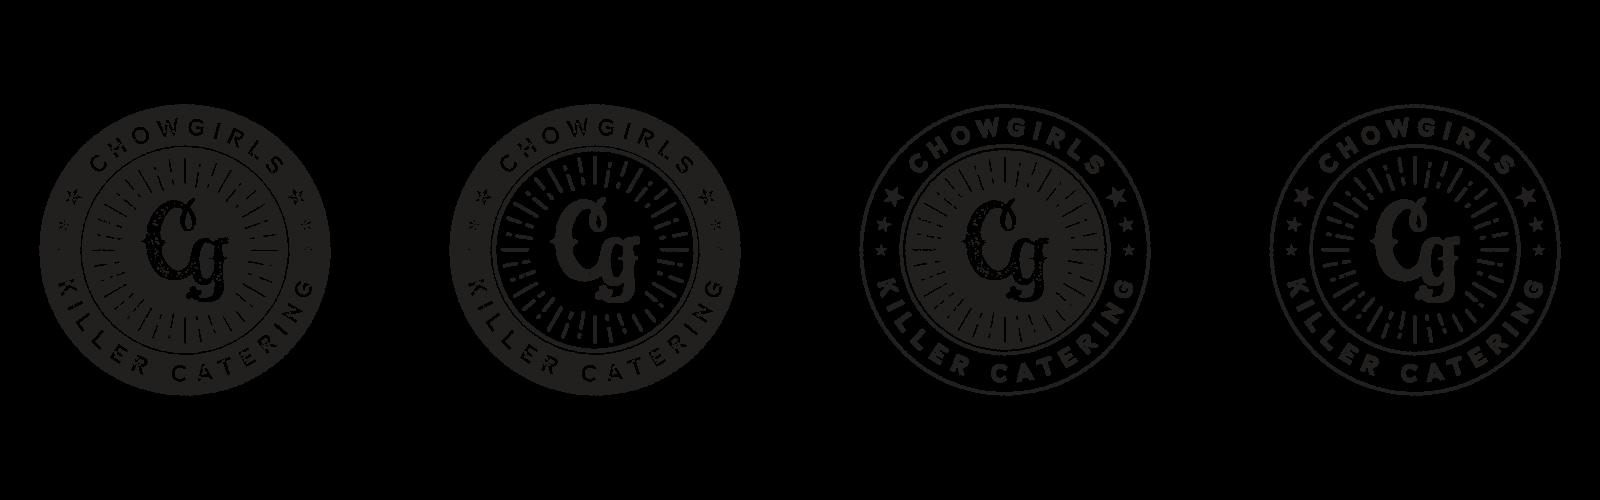 CG_Logos_All.png